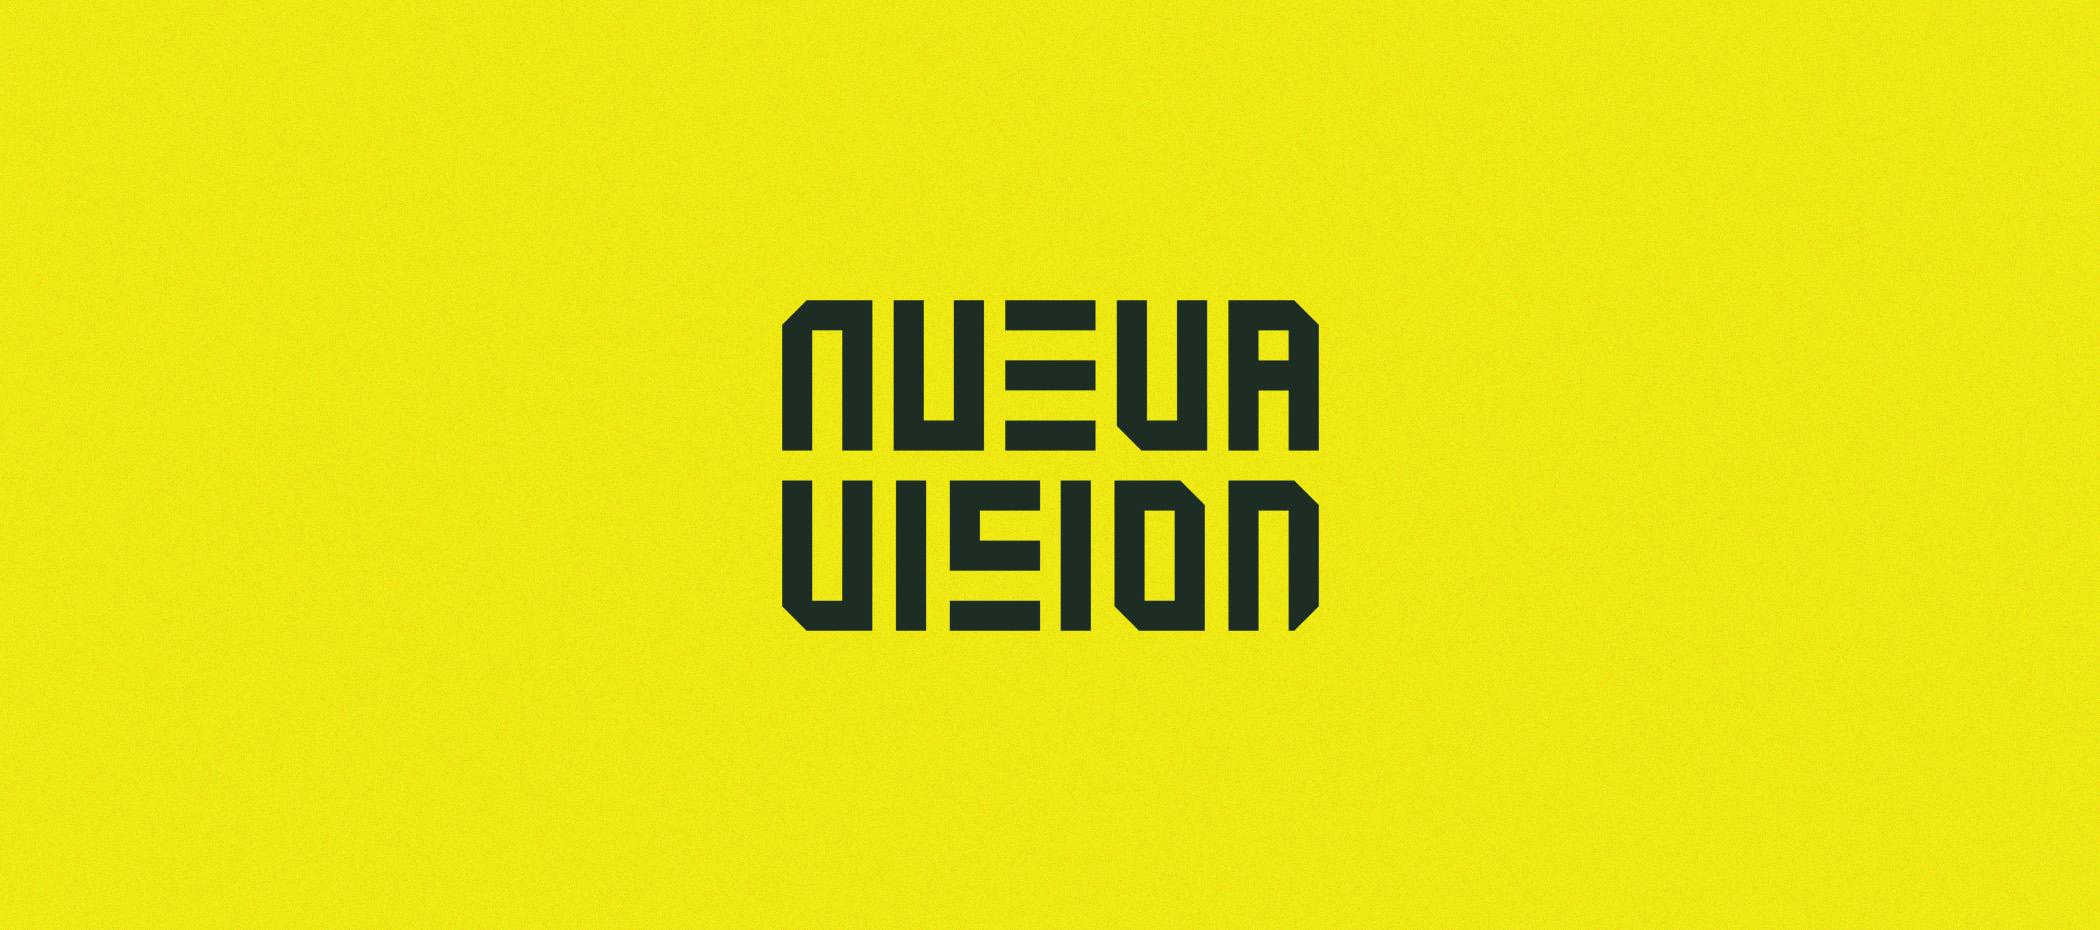 diseno logotipo - Beusual diseño grafico